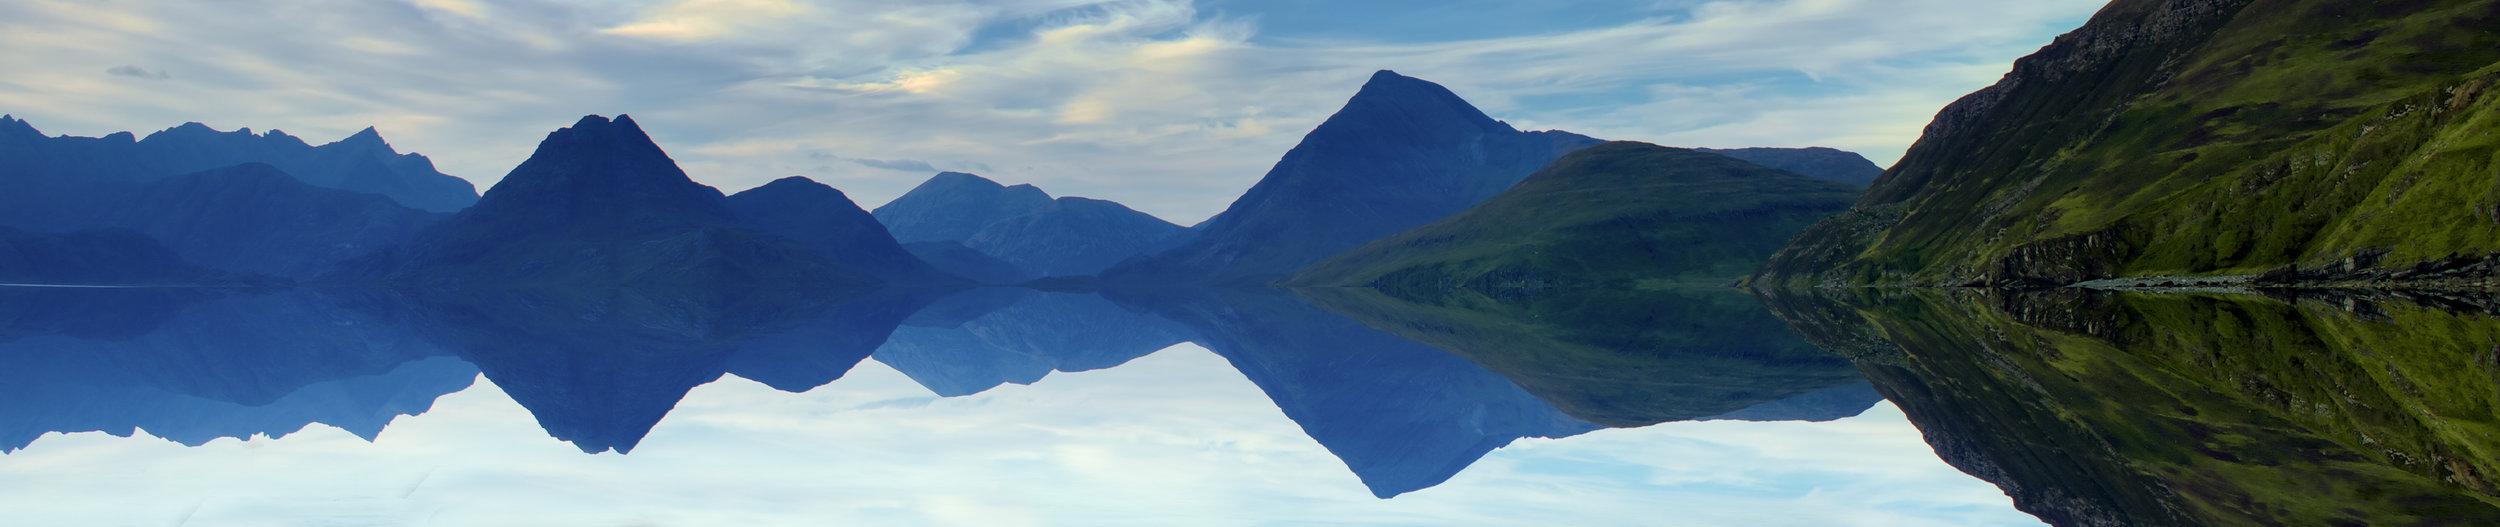 + Scotland, Highland, The Inner Hebrides: Isle of Skye